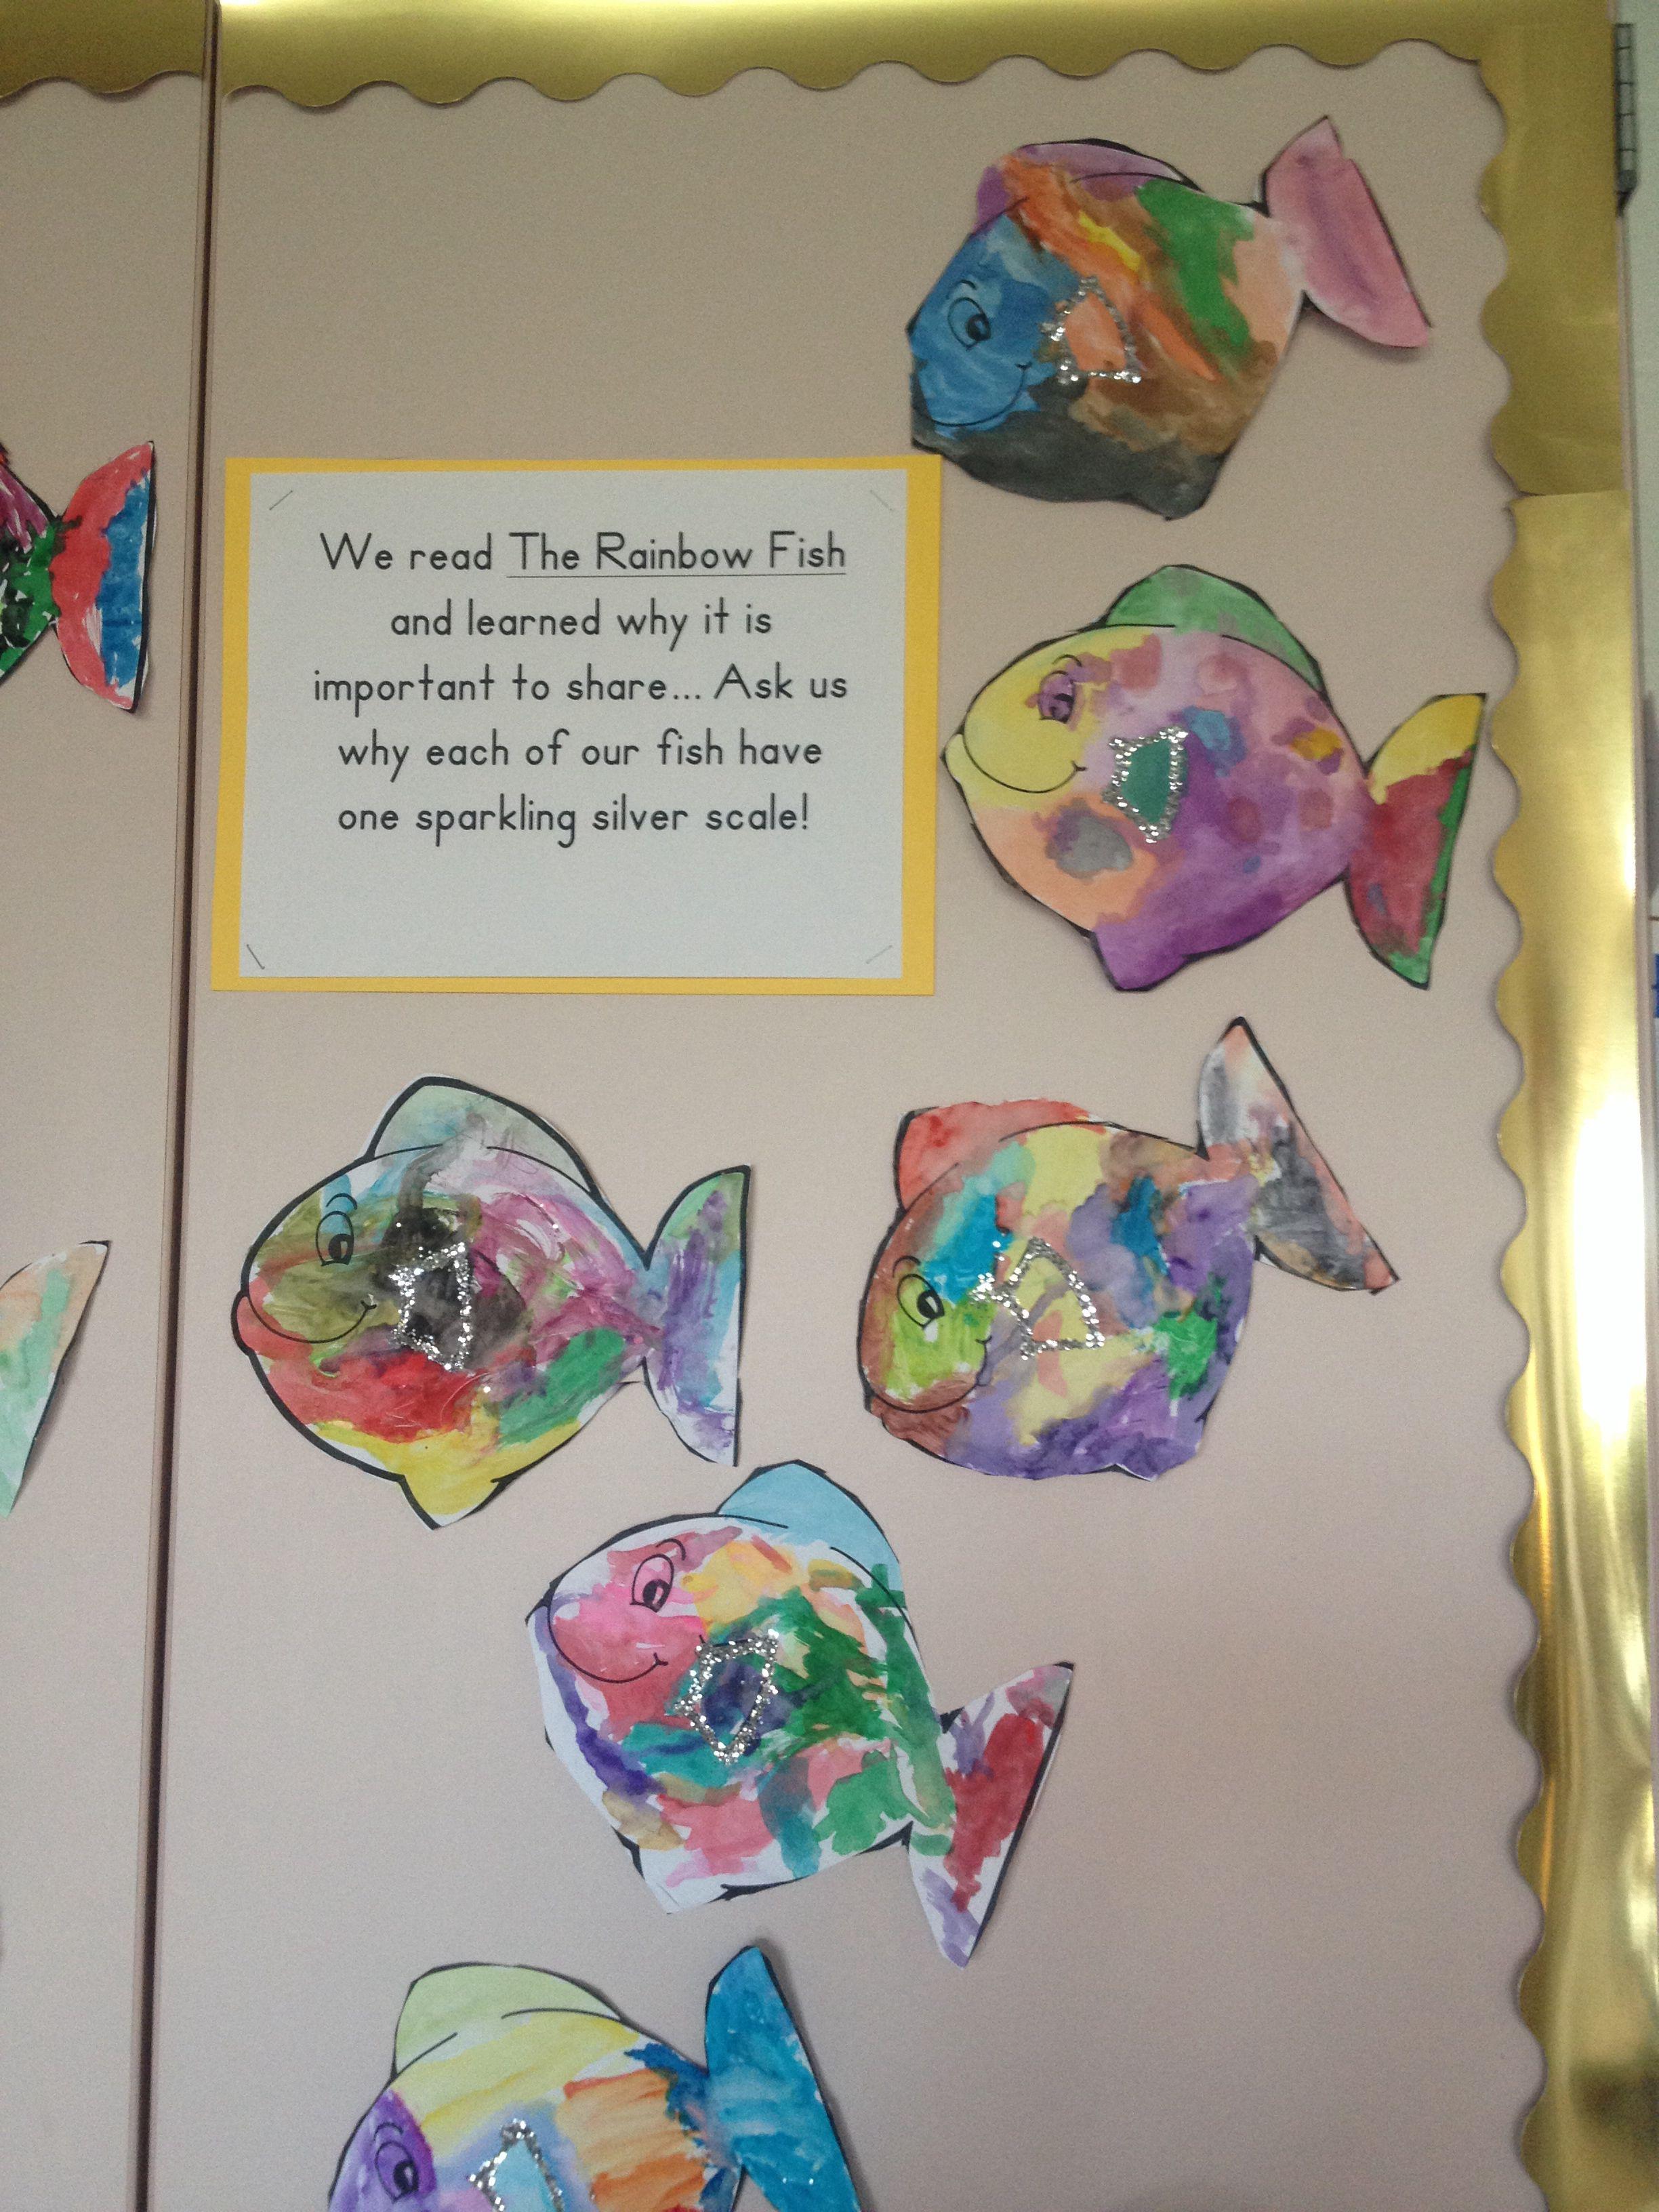 The rainbow fish activity my classroom pinterest for Rainbow fish activities